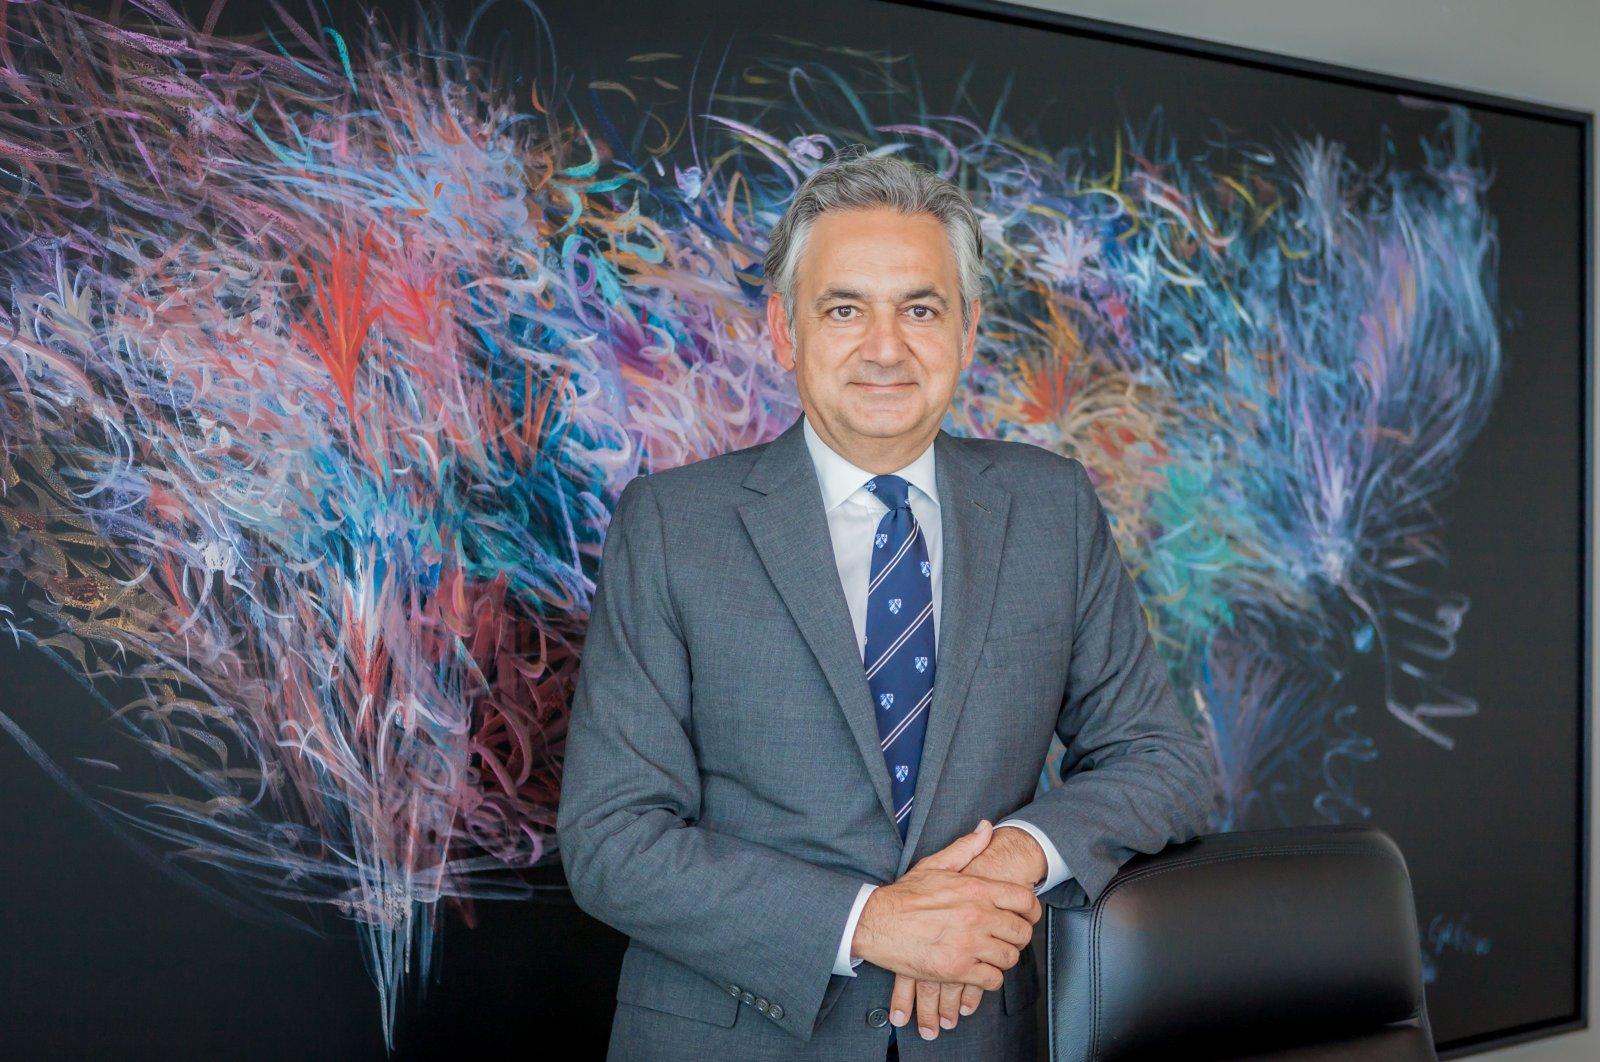 Turkey-U.S. Business Council (TAIK) Chairperson Mehmet Ali Yalçındağ. (Photo by Hatice Çınar)